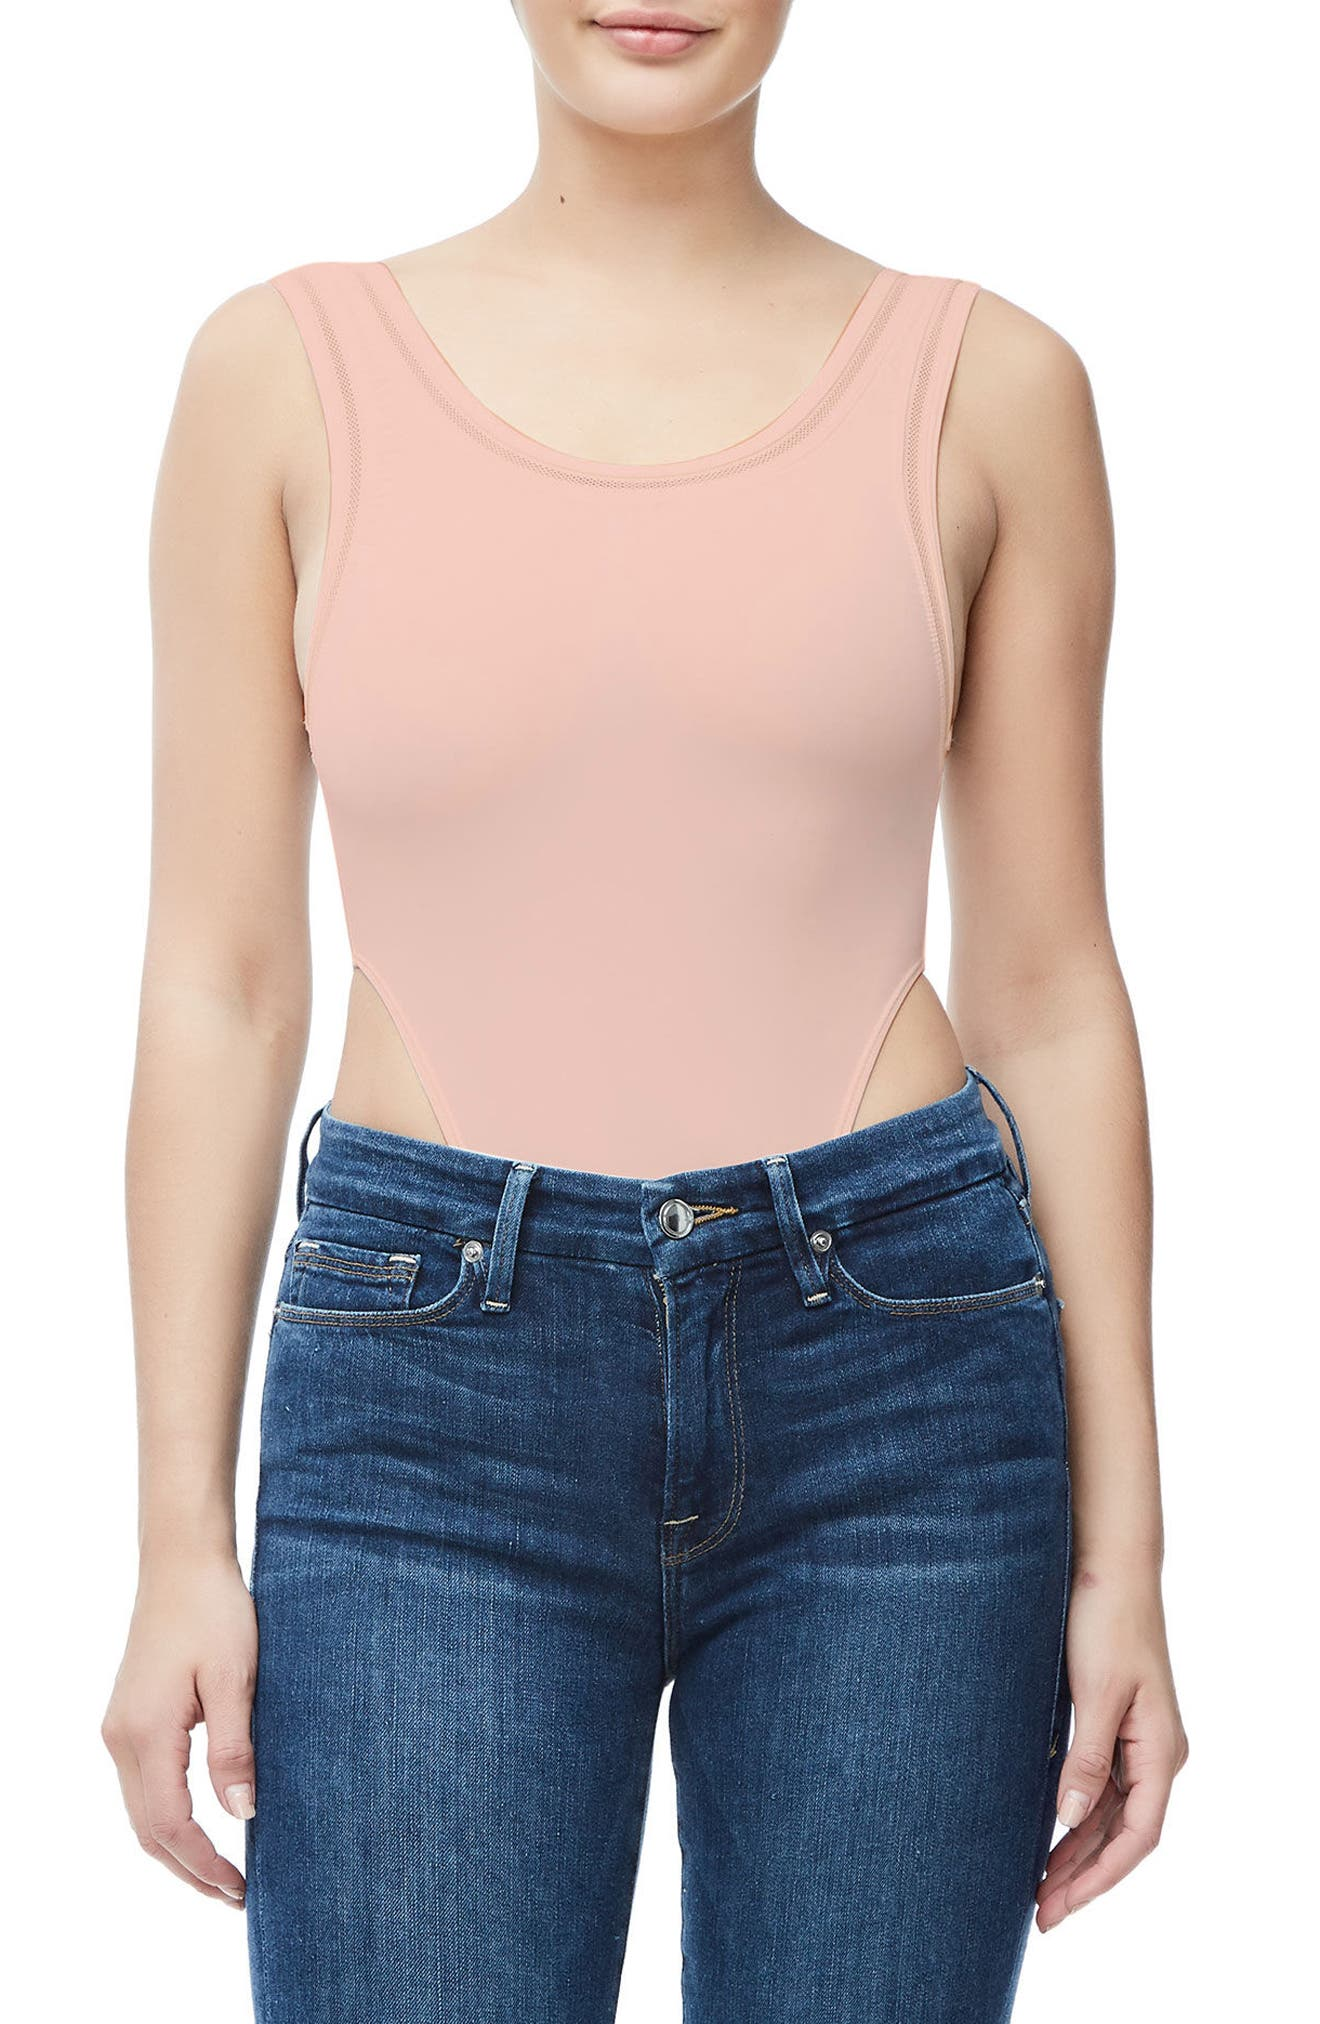 Good Body Khlo Thong Bodysuit,                             Alternate thumbnail 2, color,                             Blush001